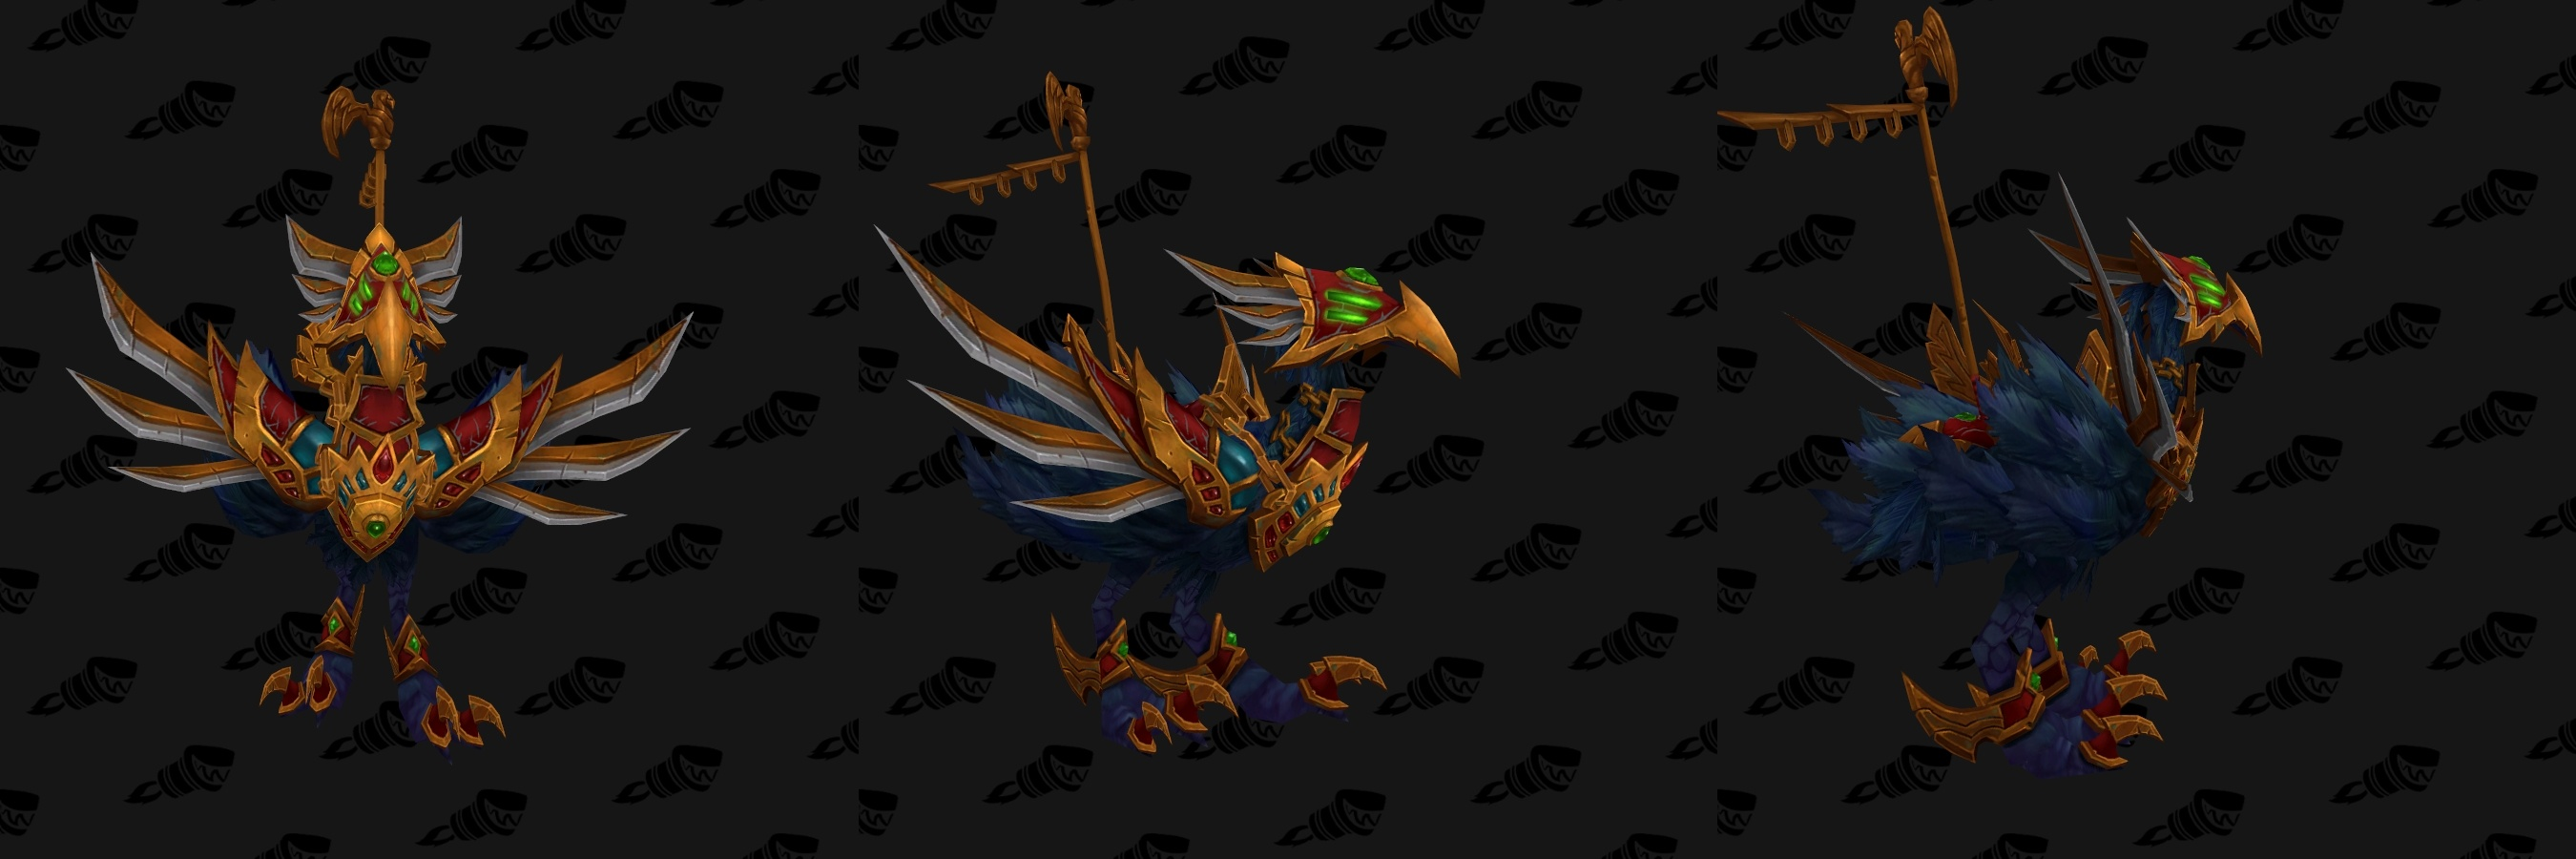 Vicious Hawkstrider